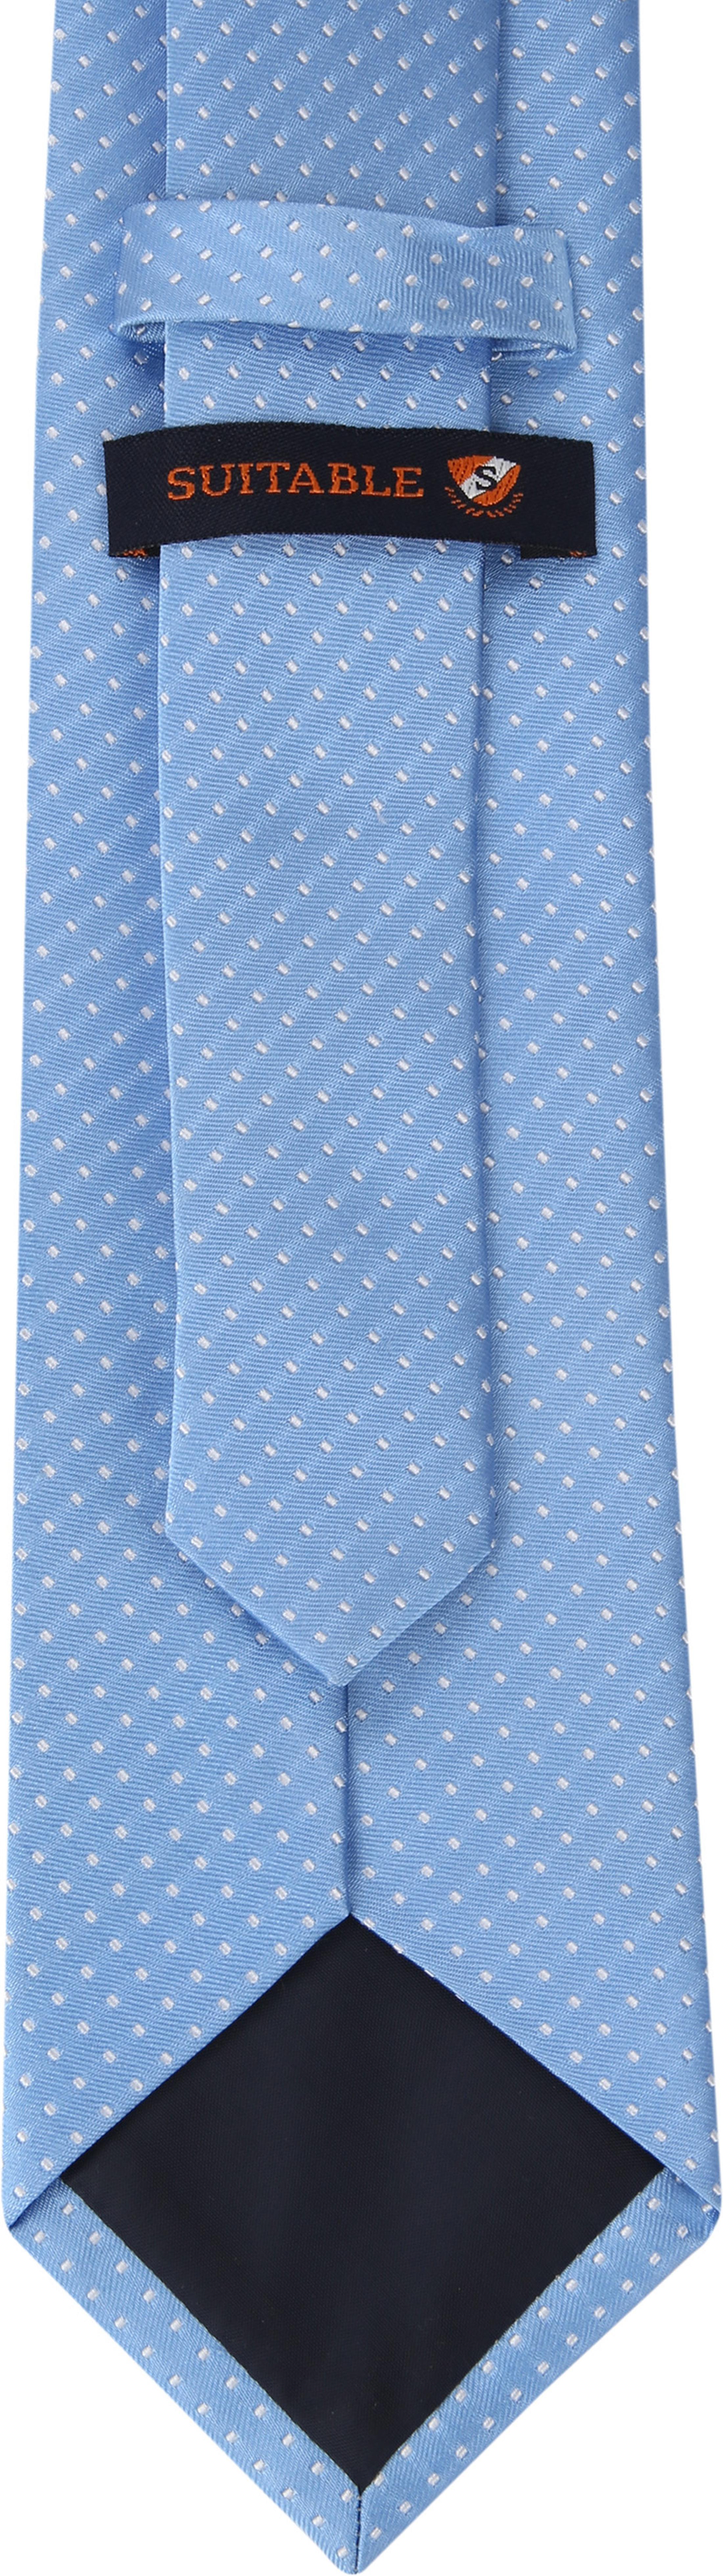 Suitable Krawatte Seide Blau F91-7 foto 2